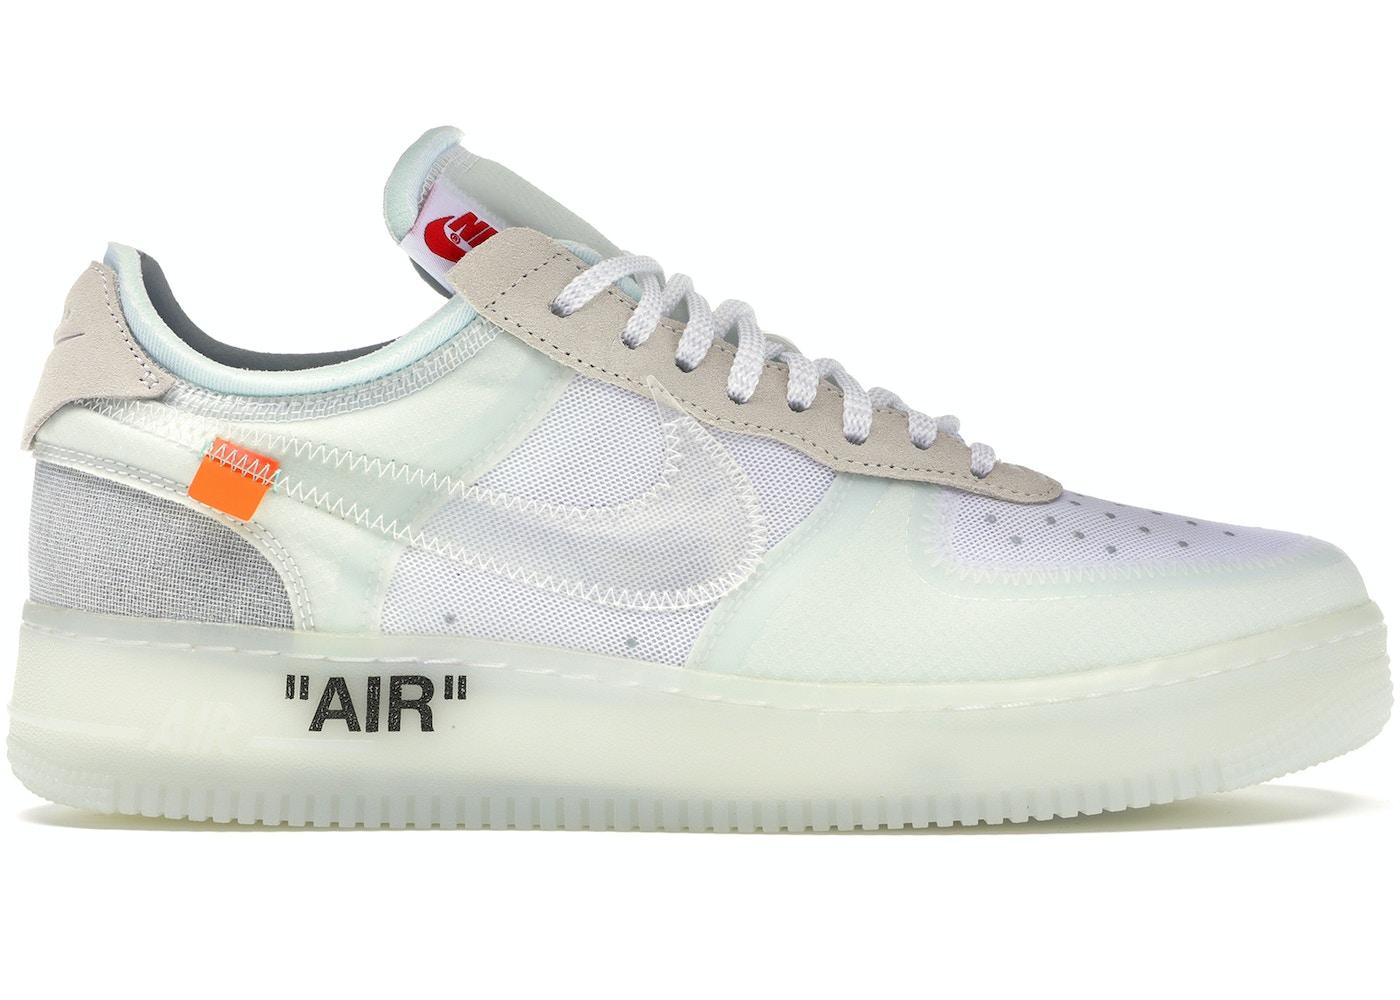 Asombro Inducir Dime  Nike Air Force 1 Low Off-White - AO4606-100